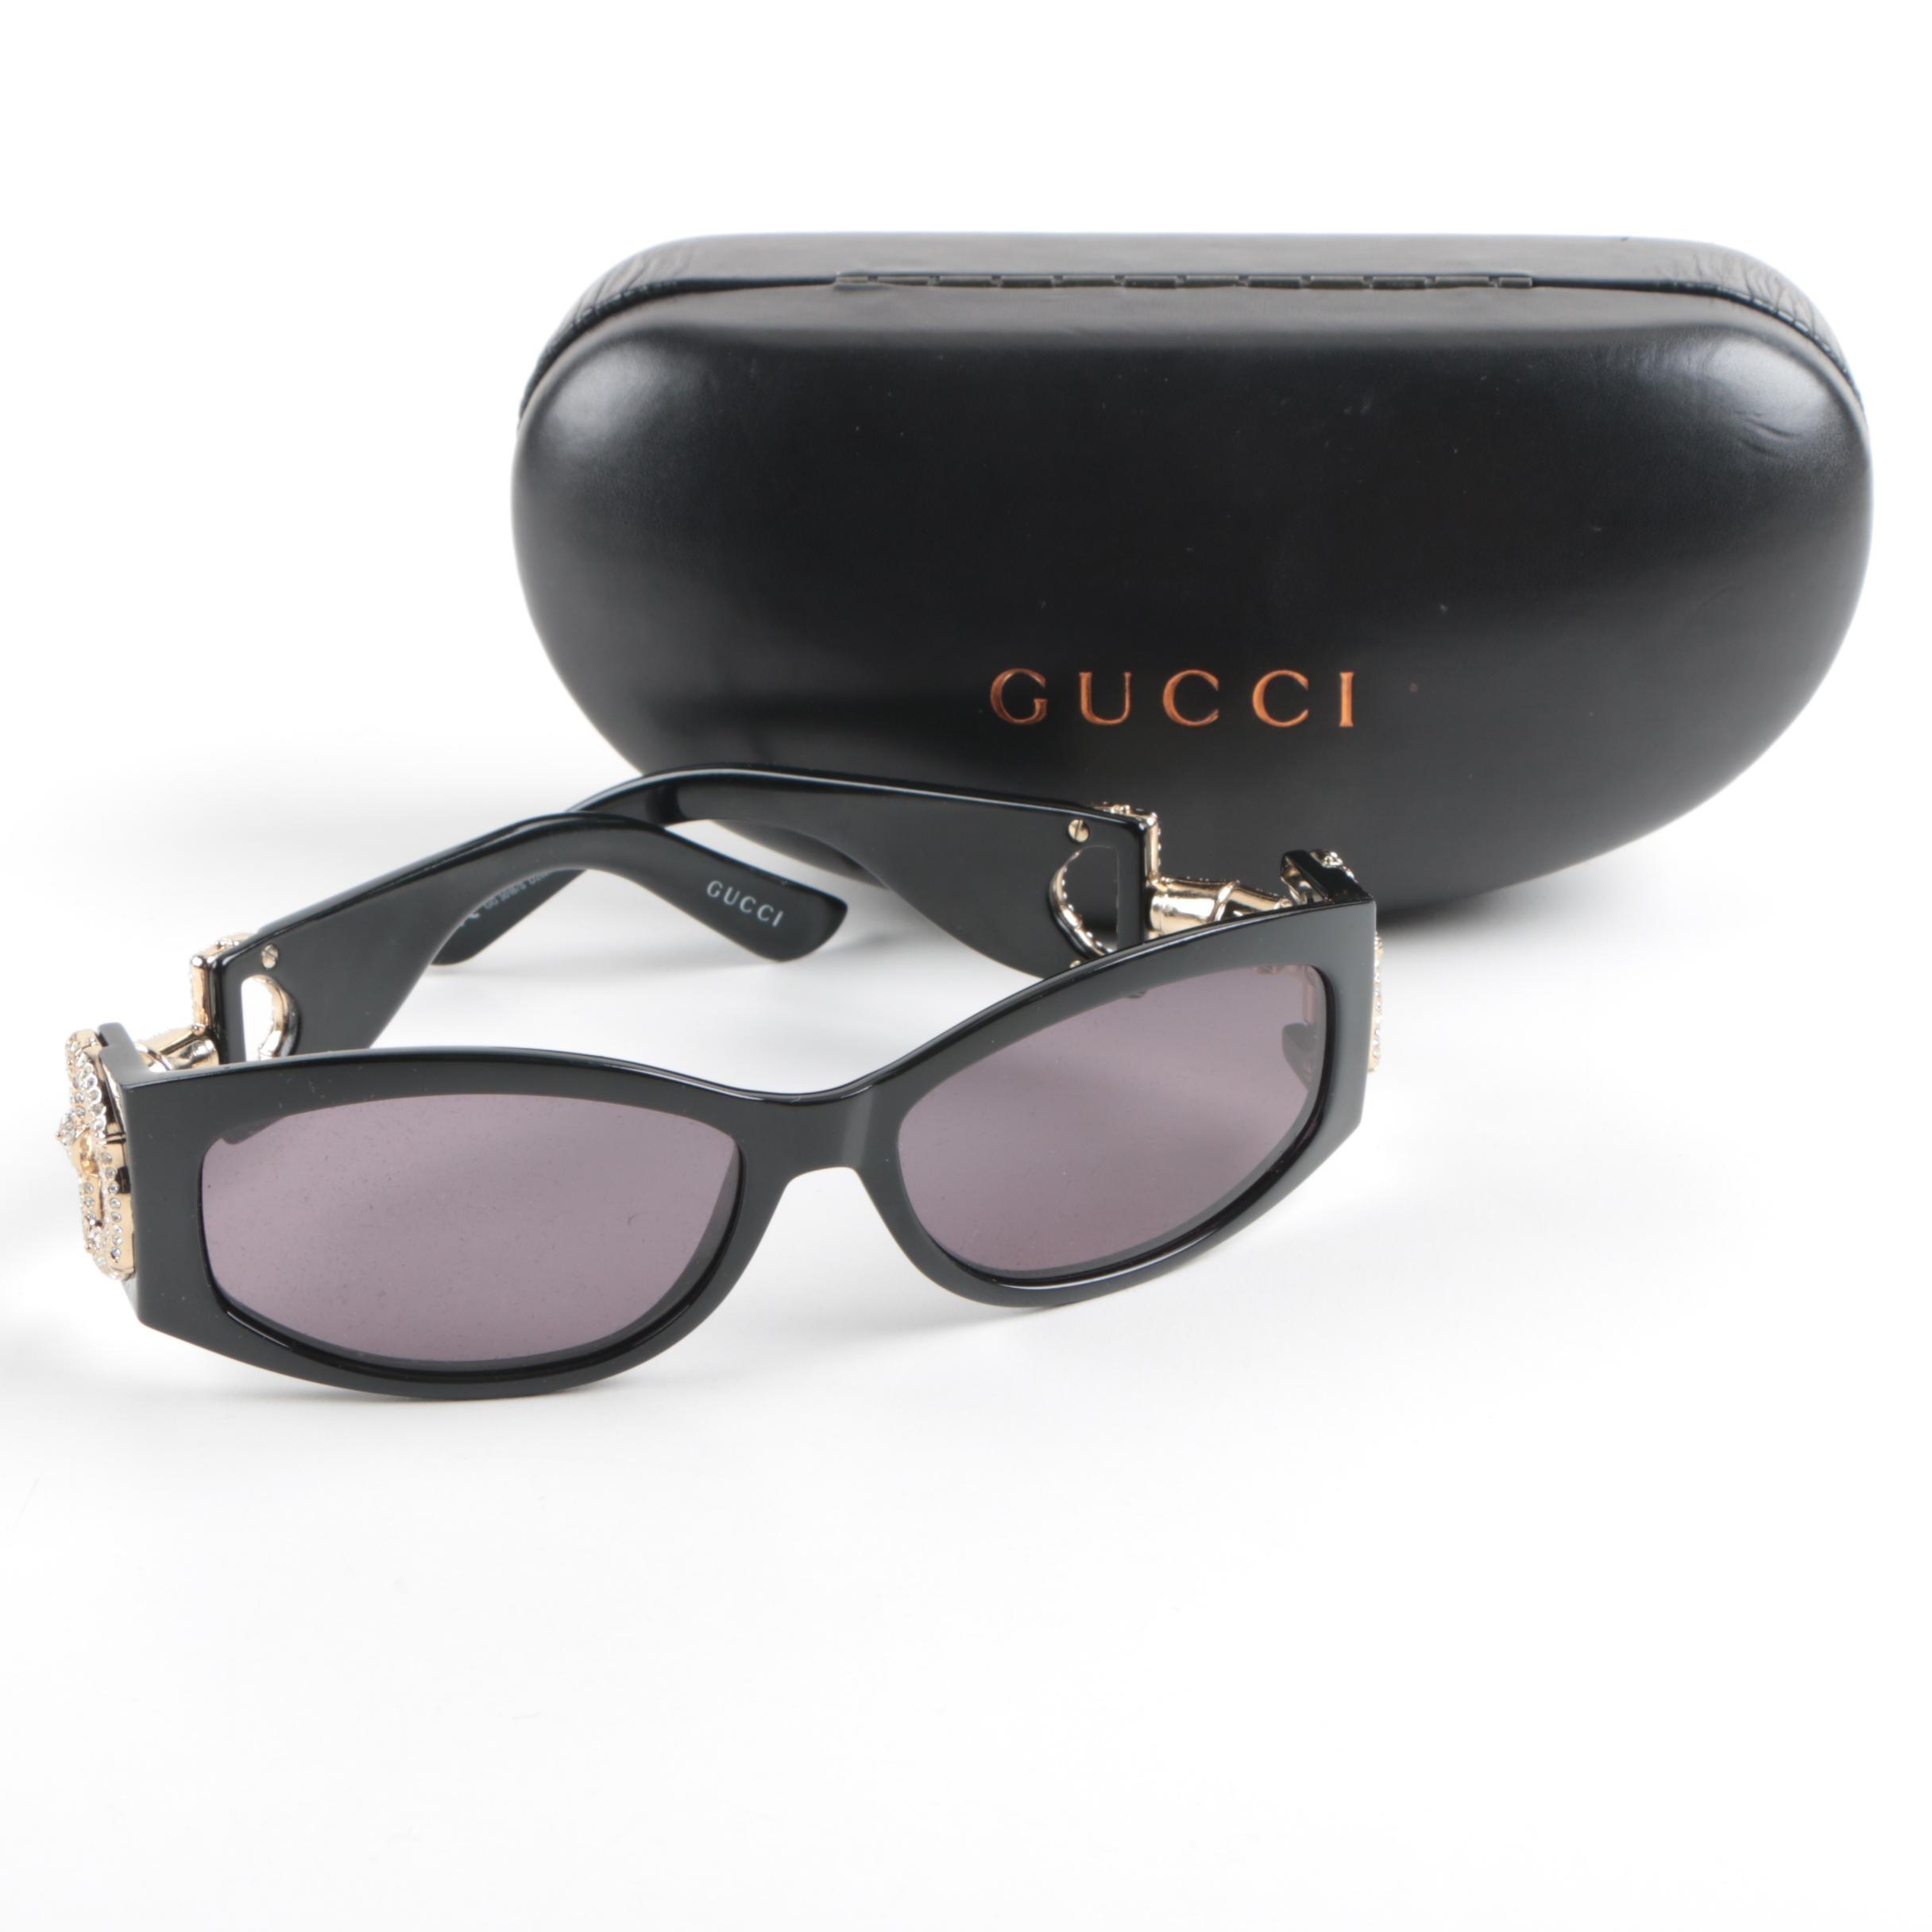 Women's Gucci Sunglasses with Case